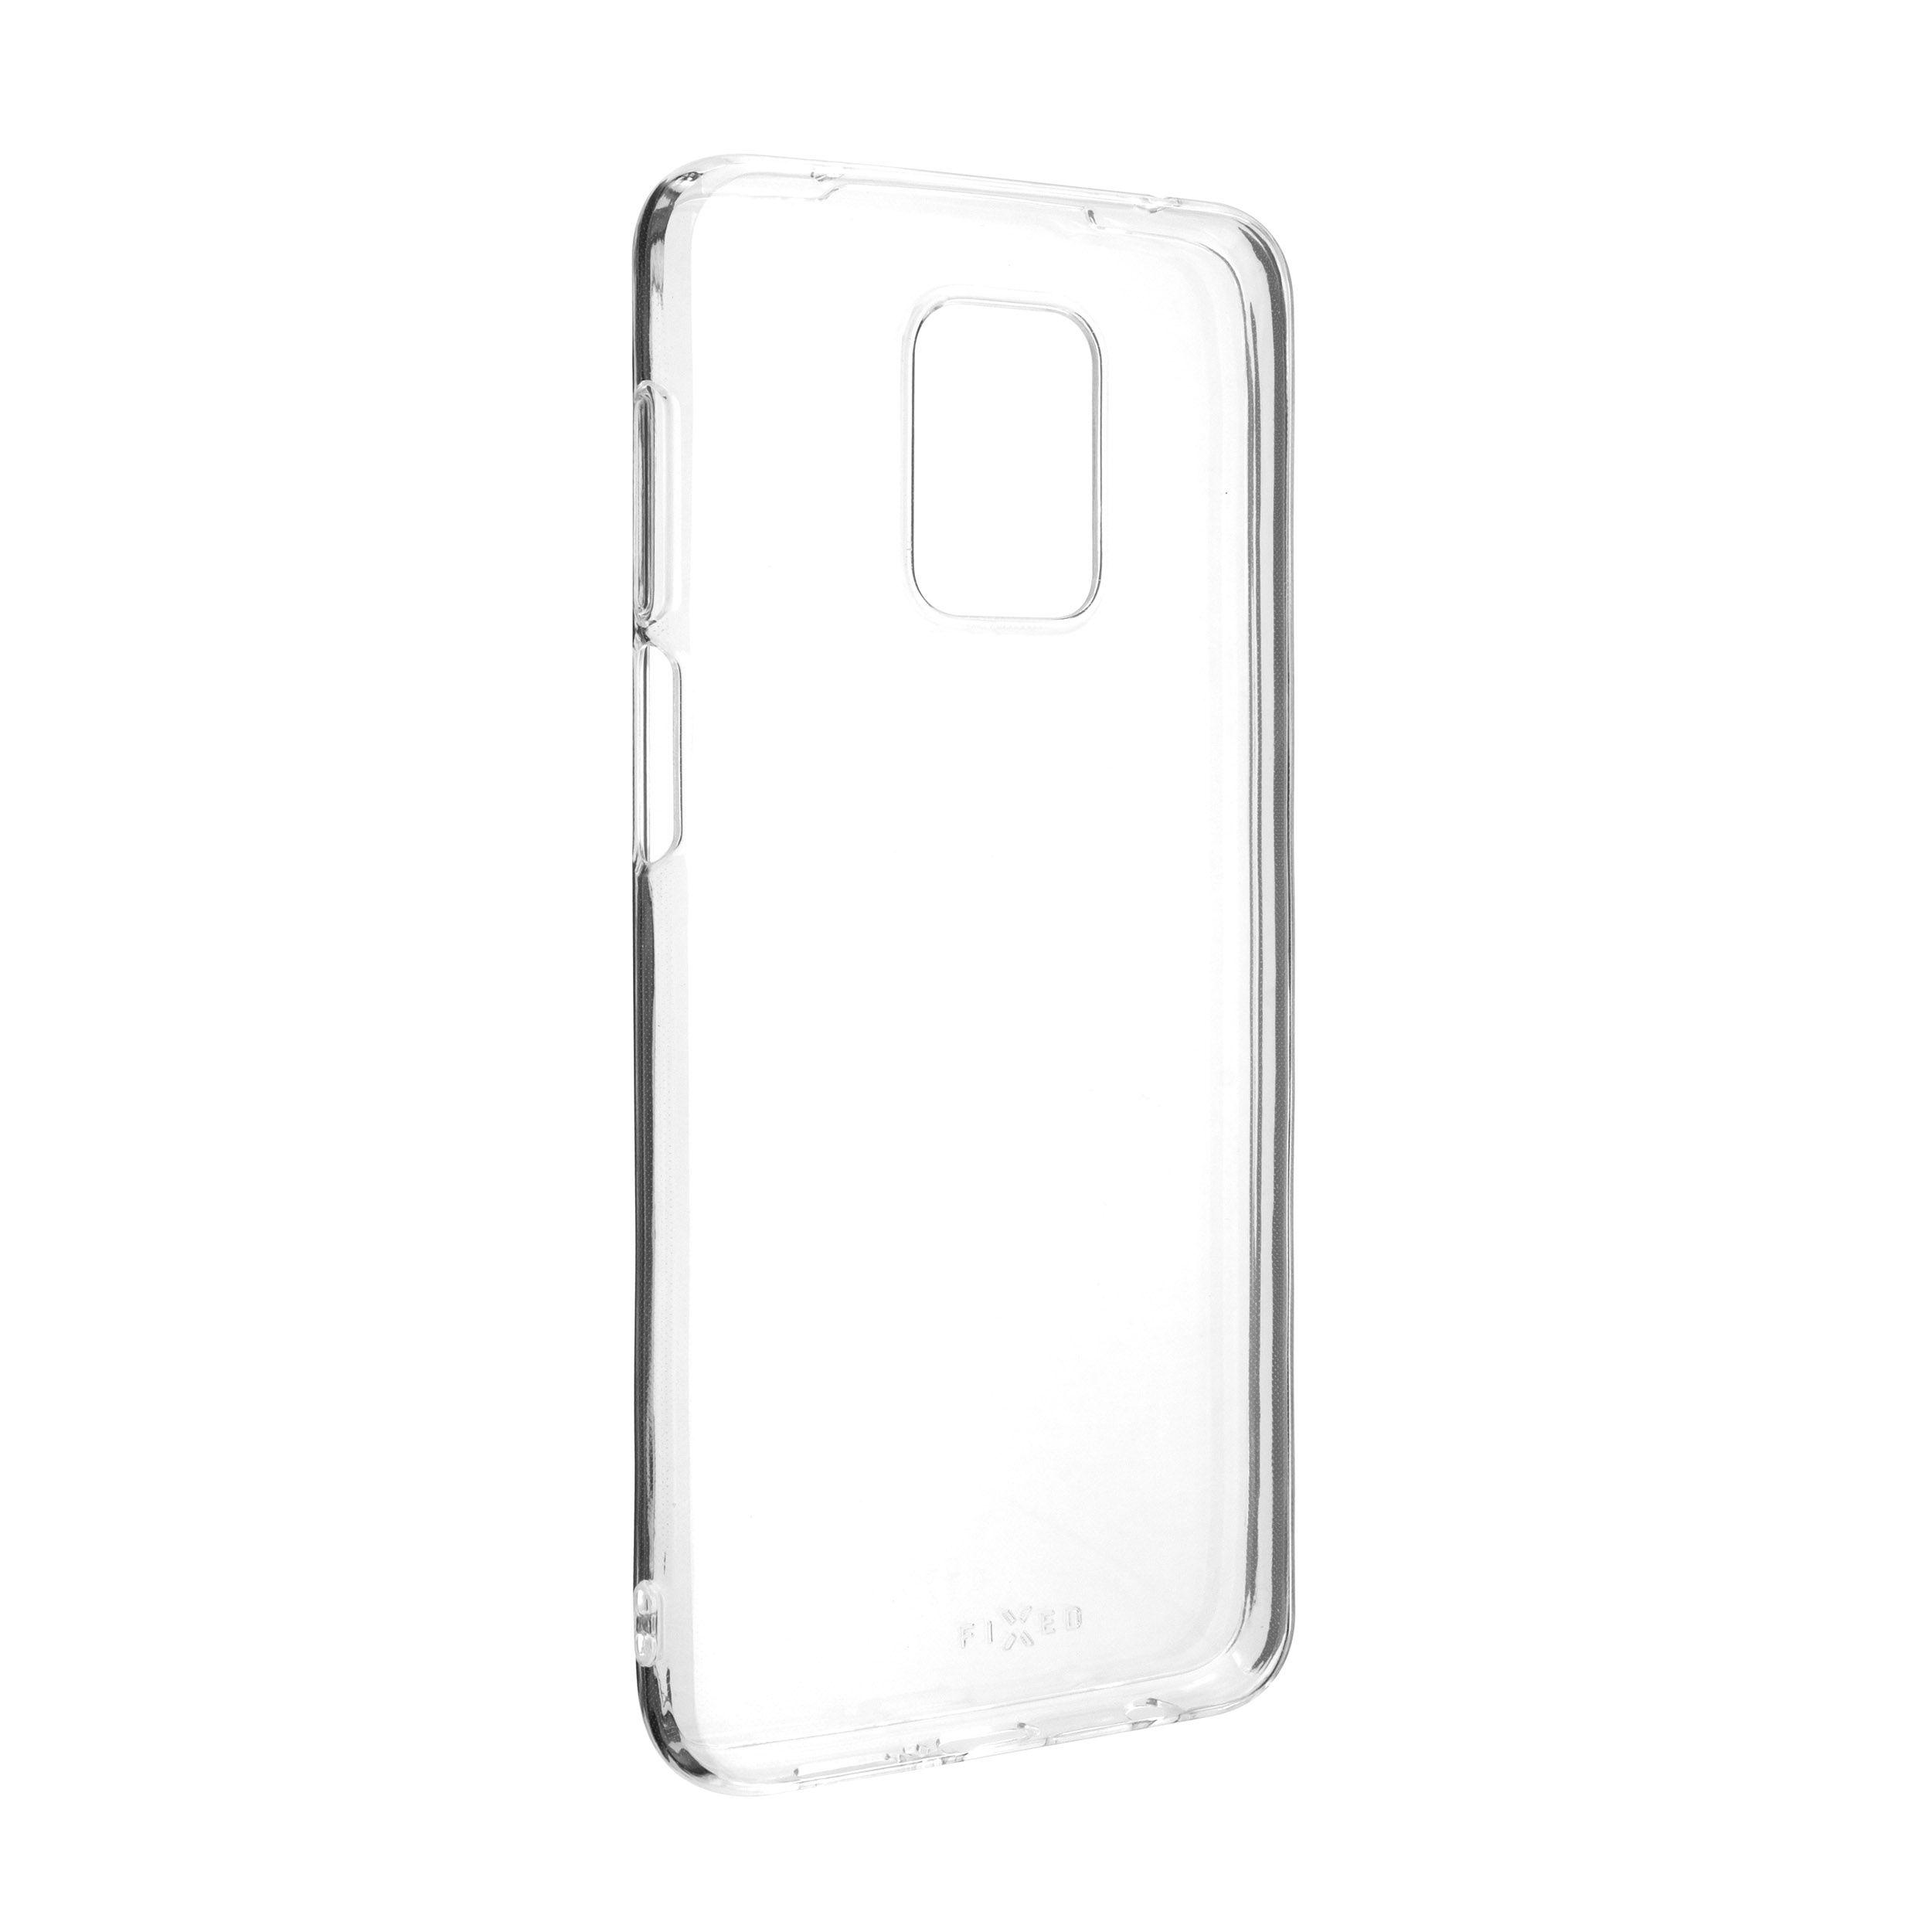 TPU gelové pouzdro FIXED pro Redmi Note 9 Pro/9 Pro Max/Note 9S, čiré